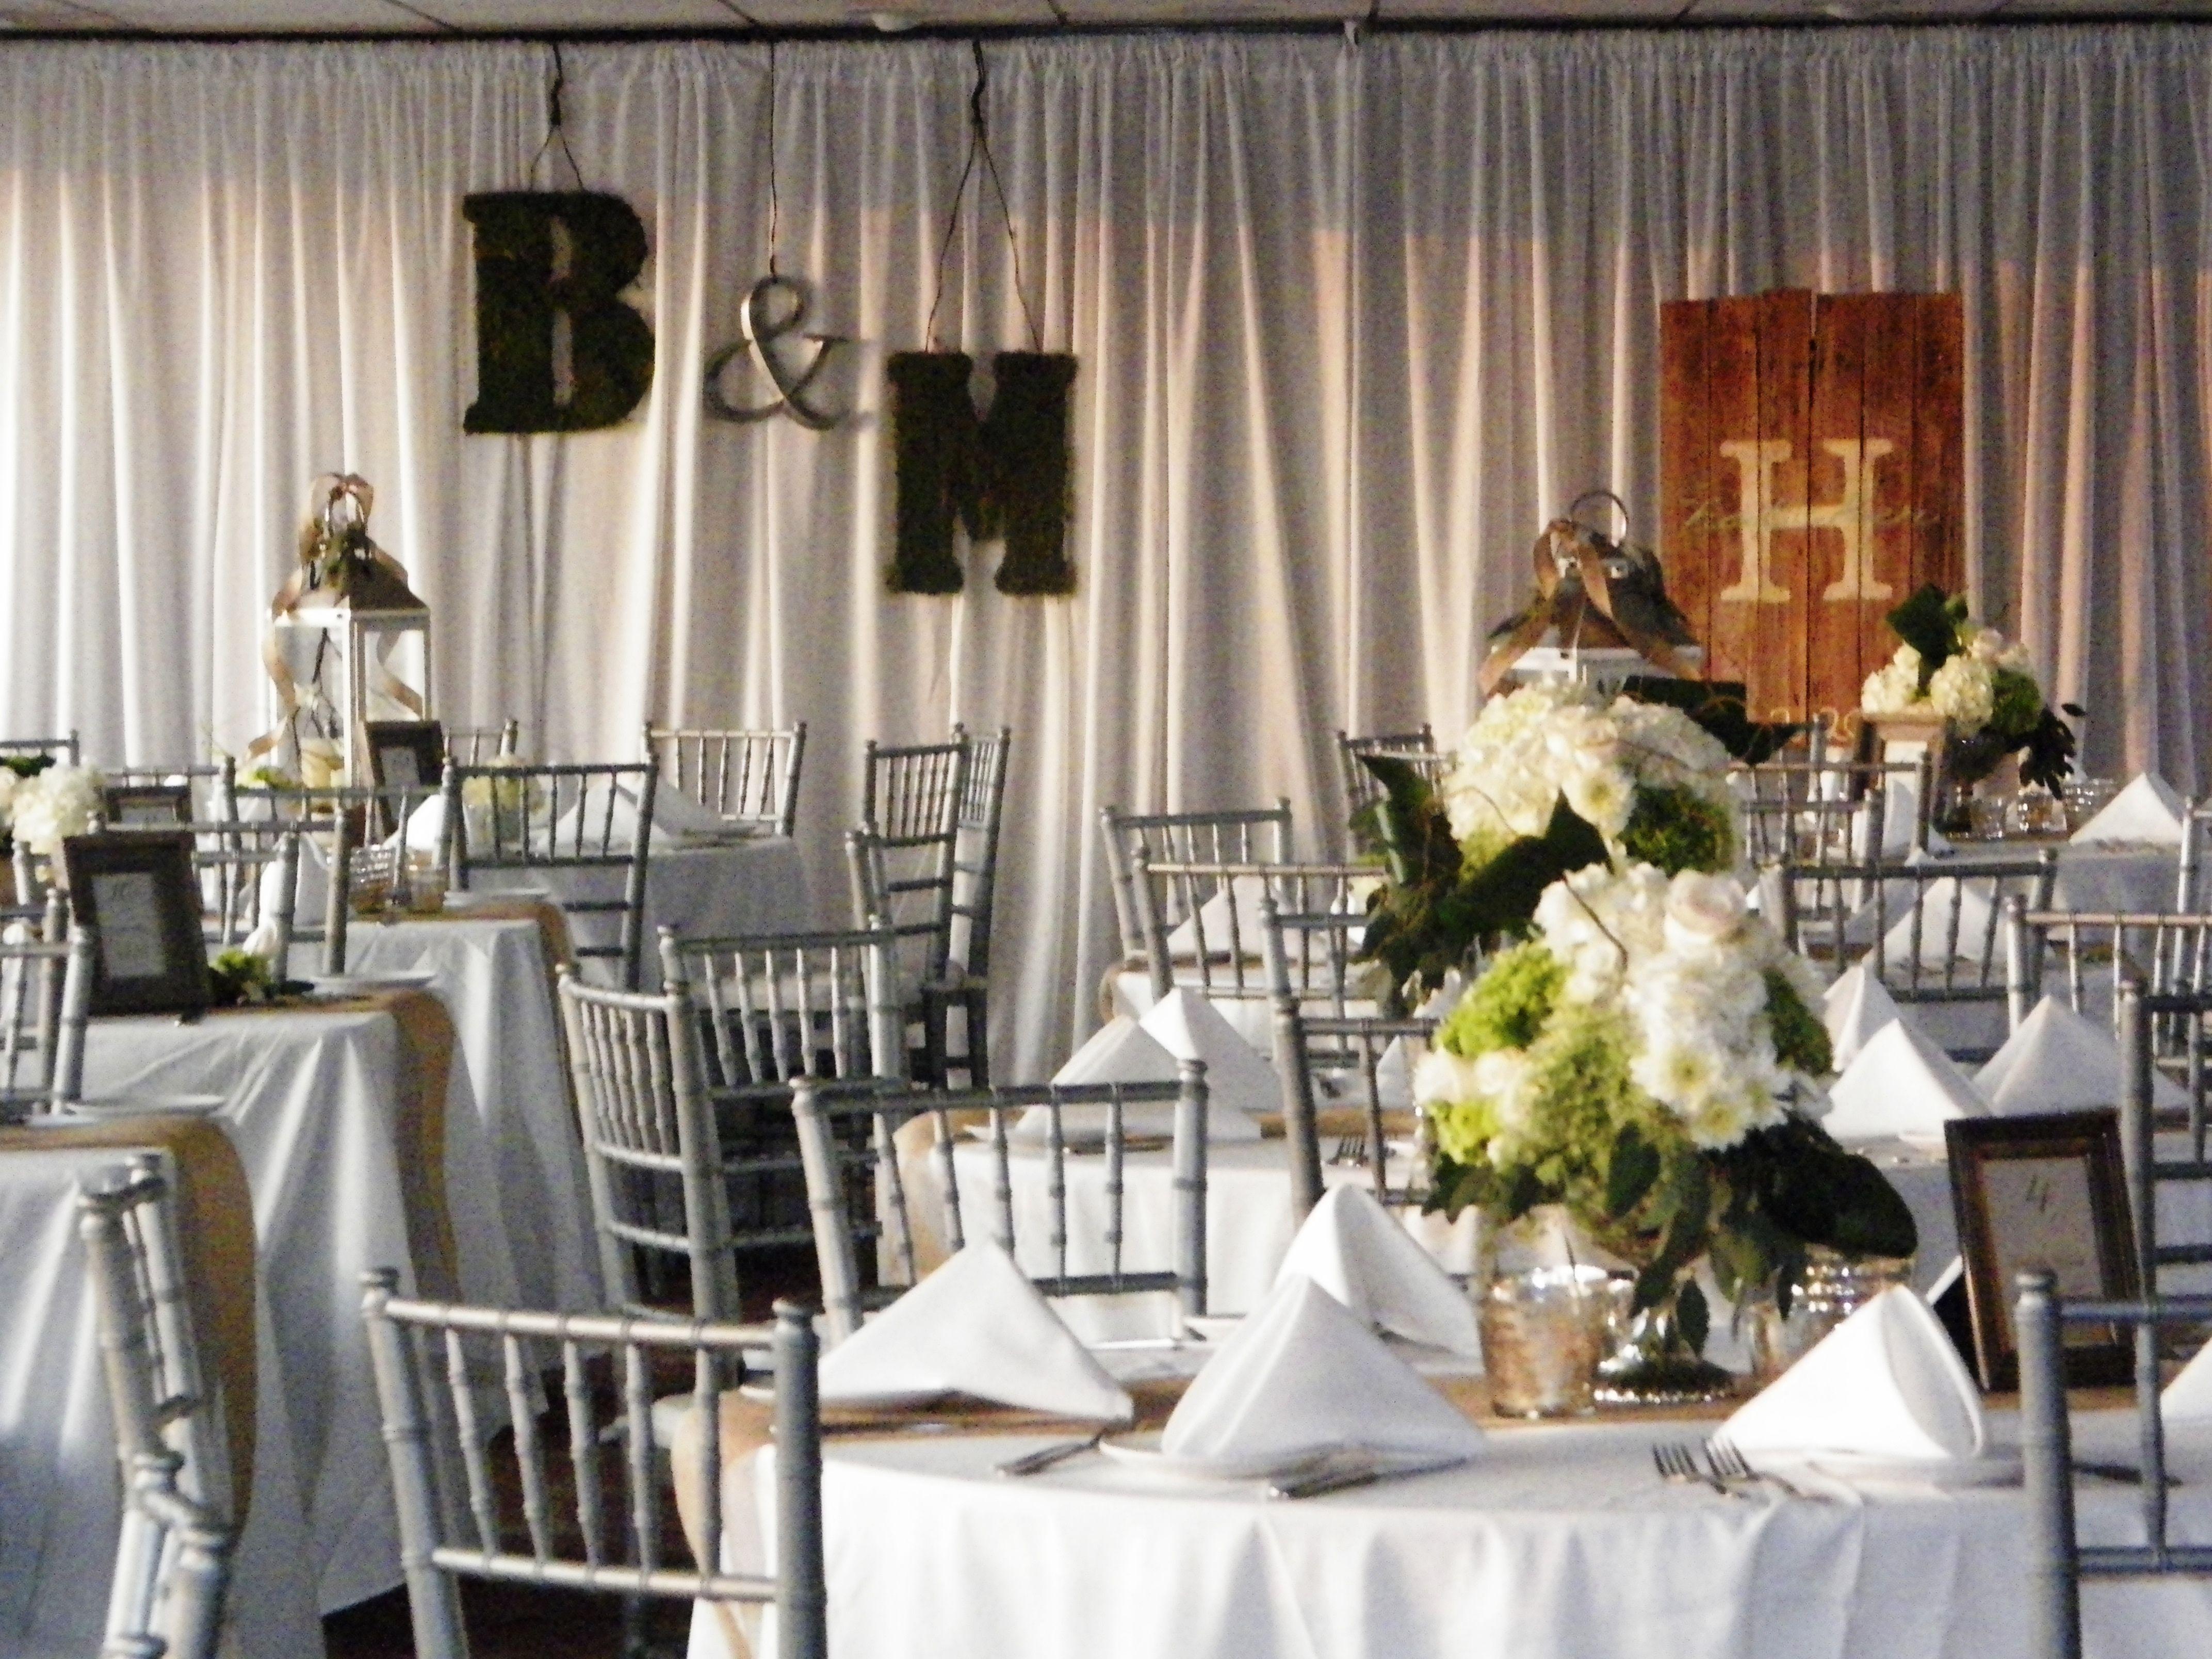 Destin Wedding Venues & Packages   Destin florida wedding ...